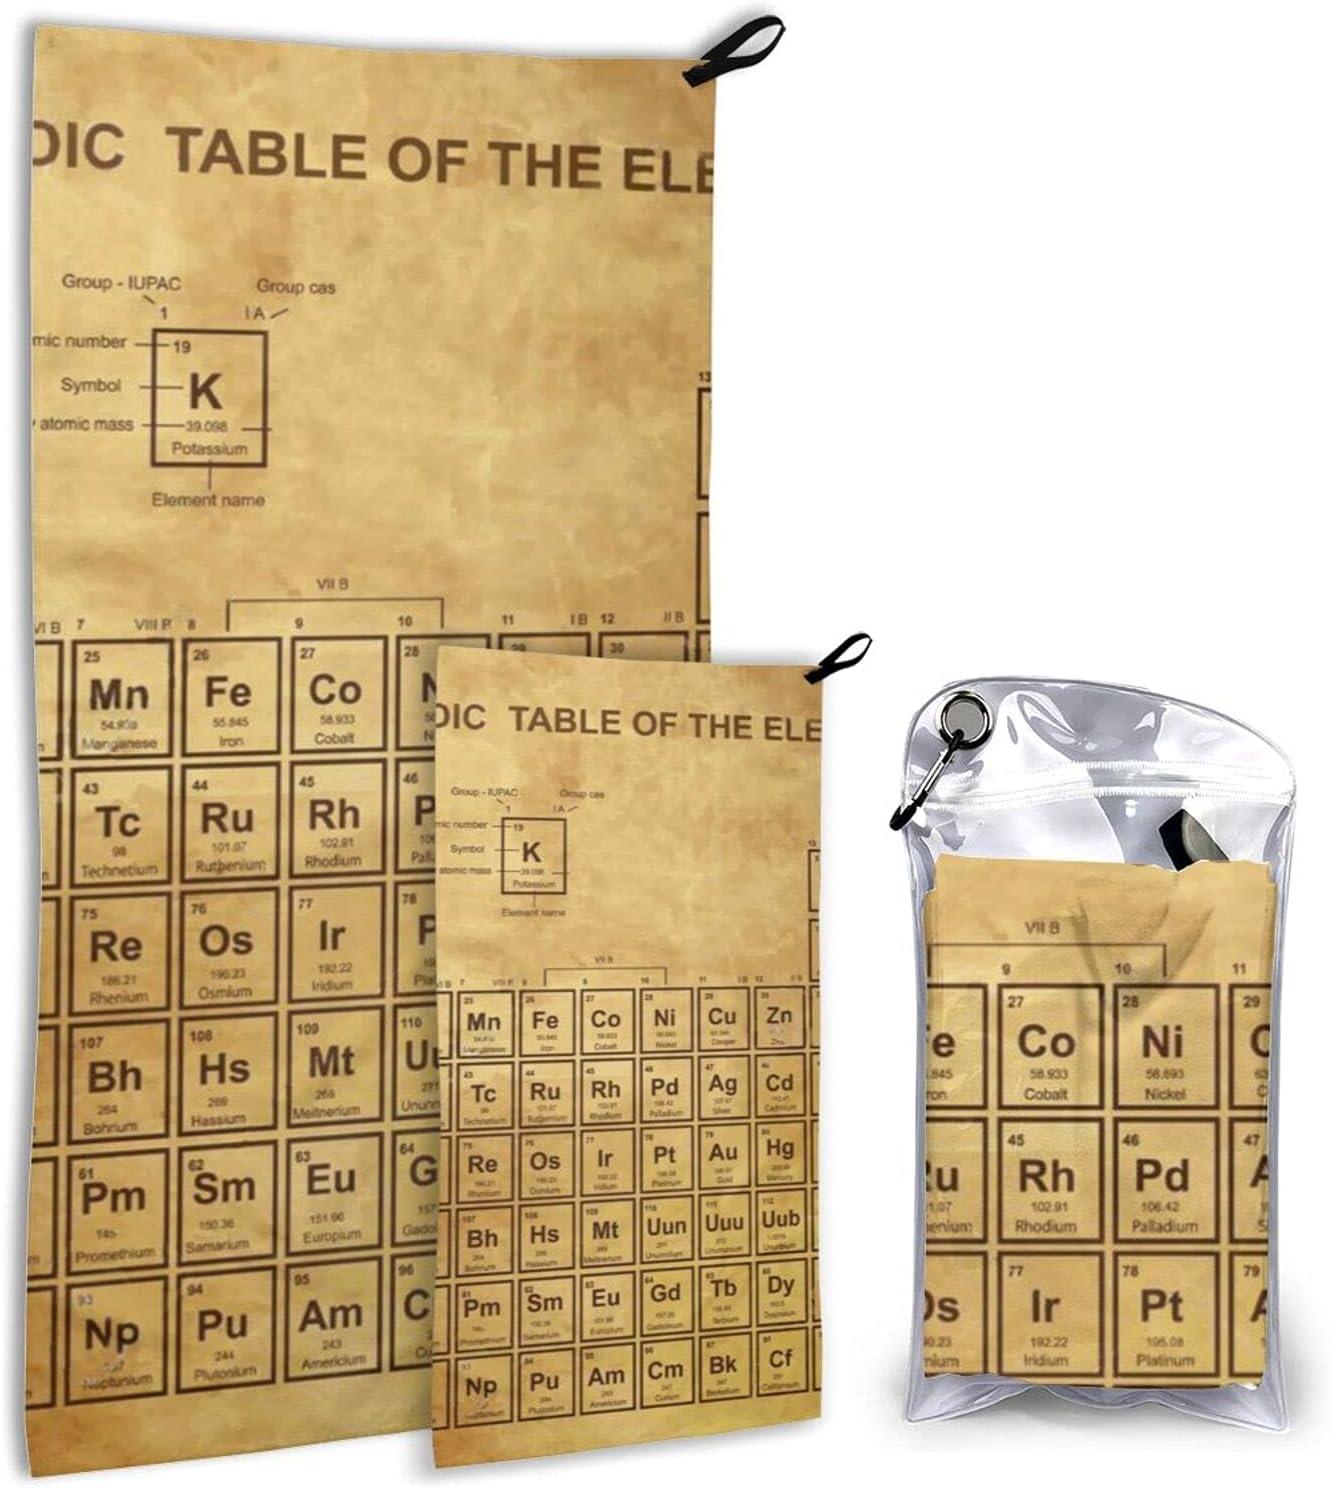 Elements Chemistry Scientists Student 2 Towels shipfree Microfiber Latest item Pack